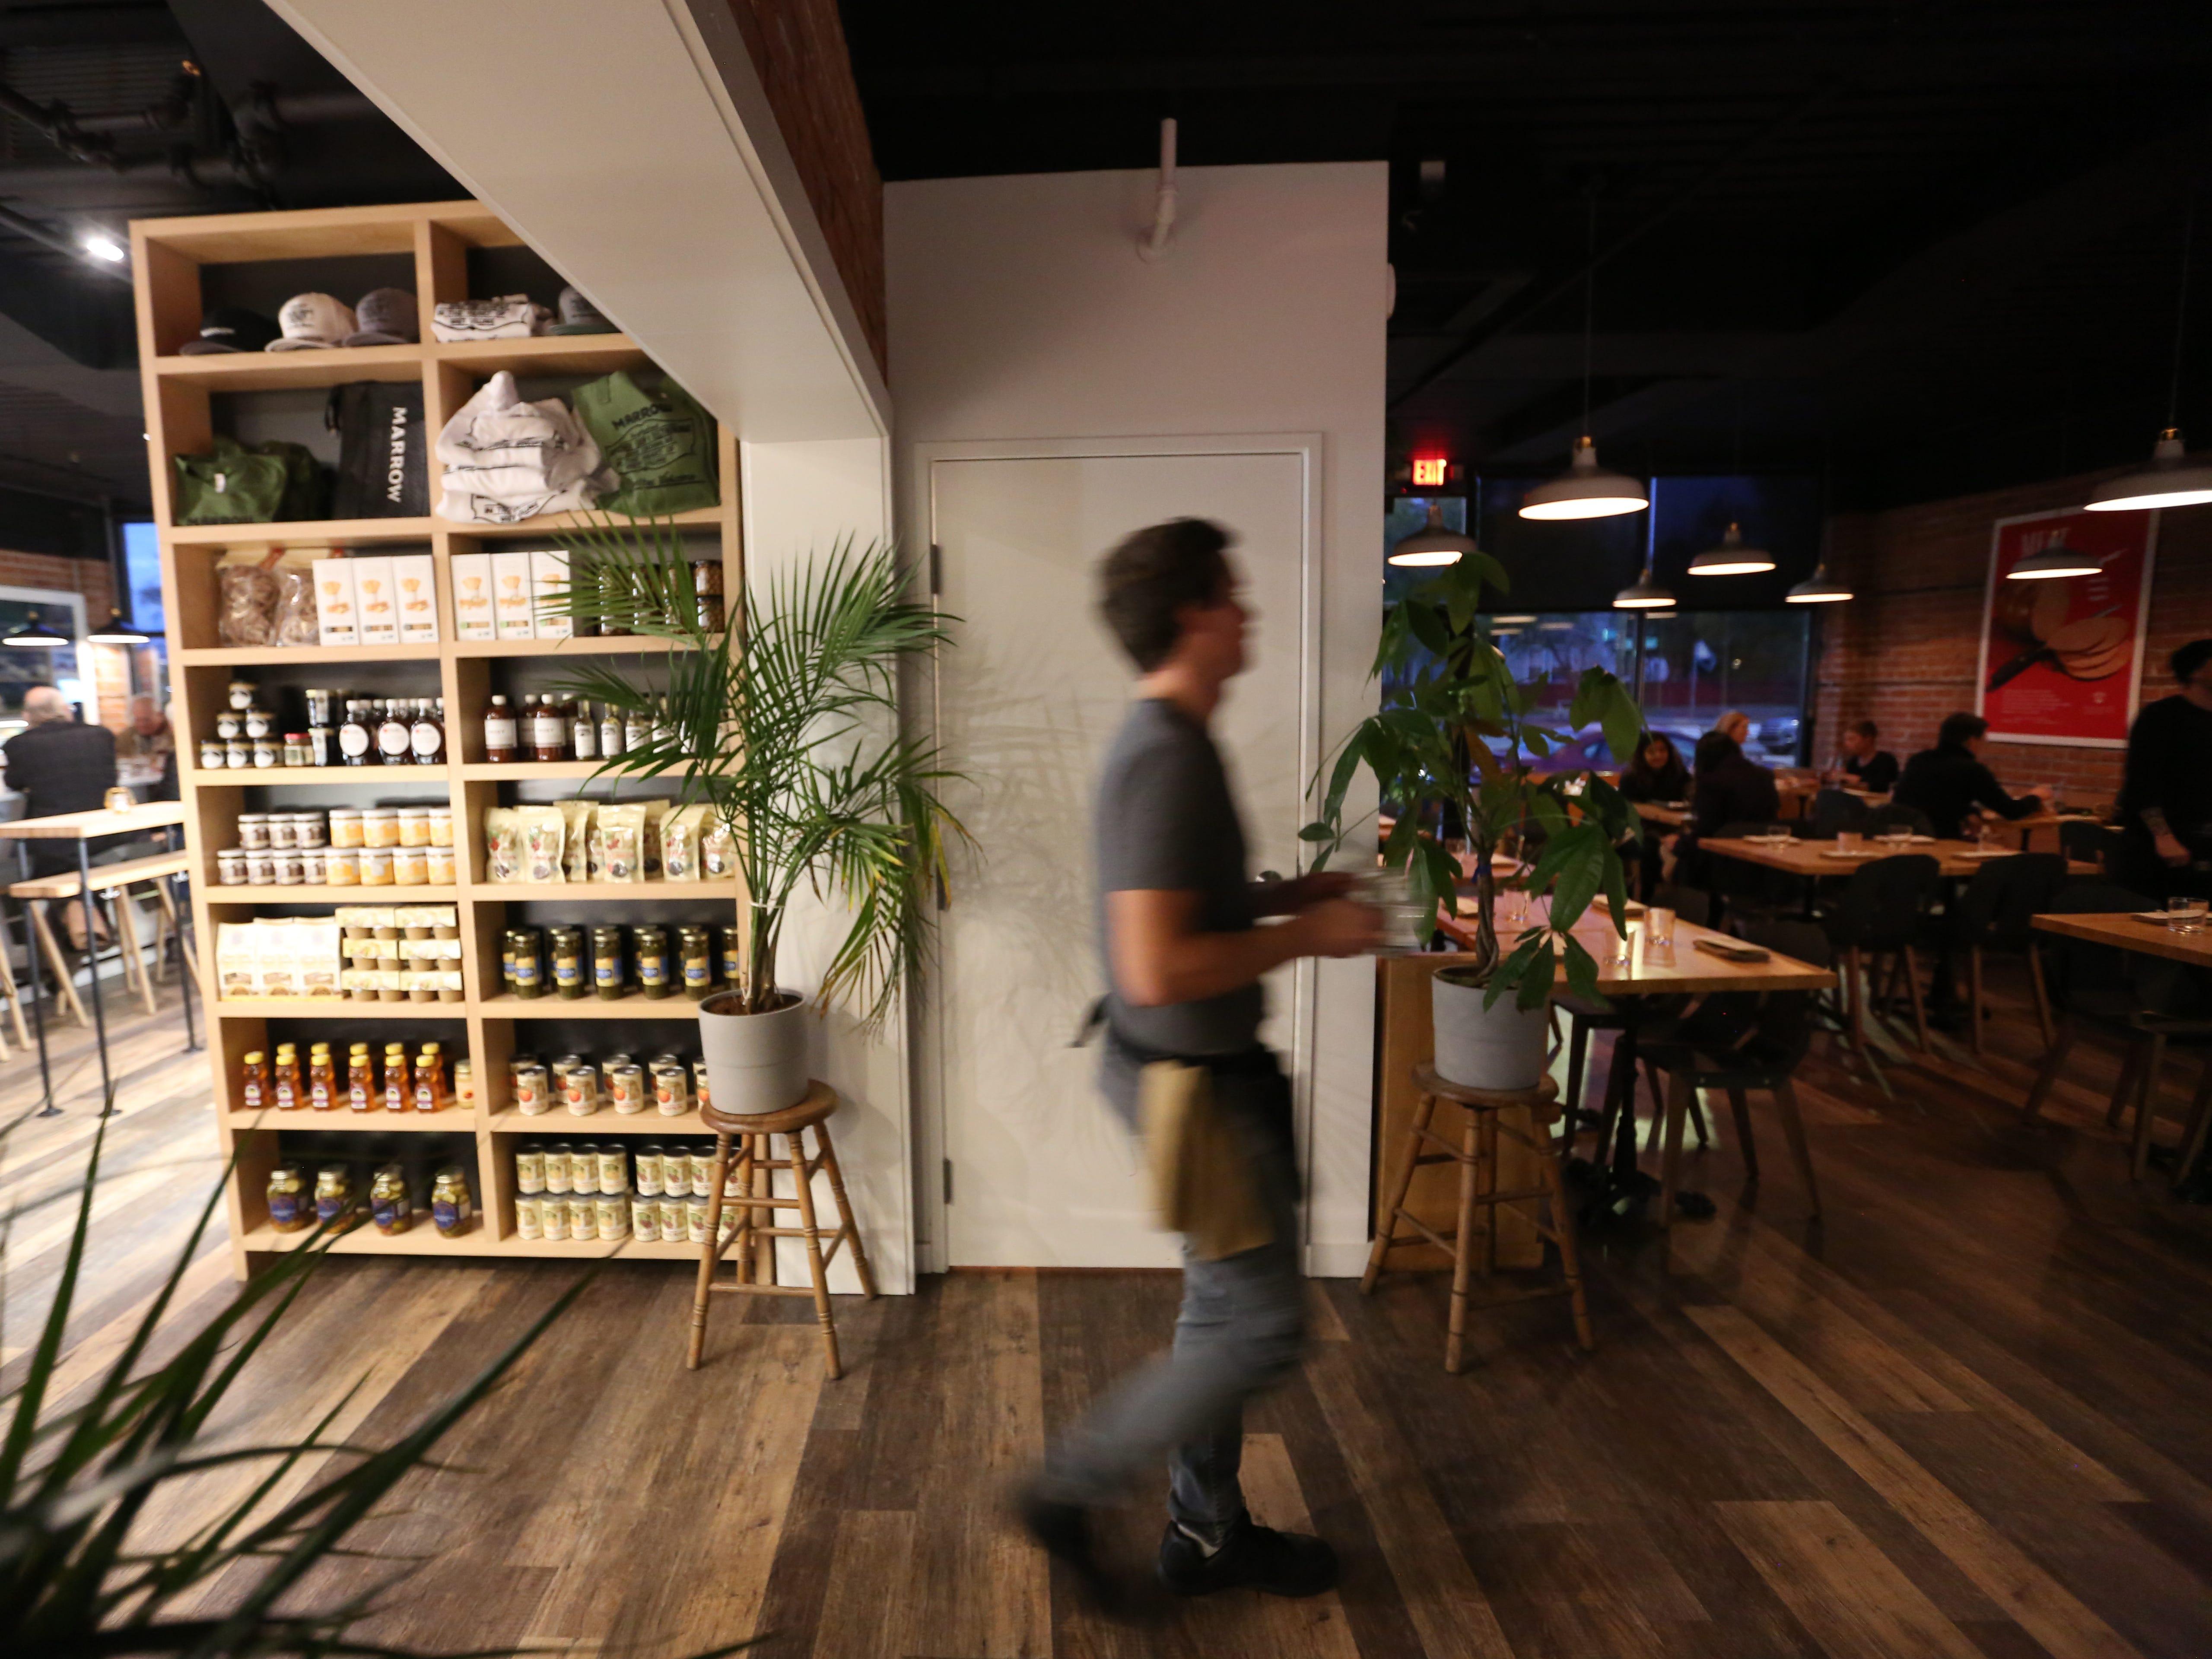 Line cook shortage is changing metro Detroit's restaurant industry